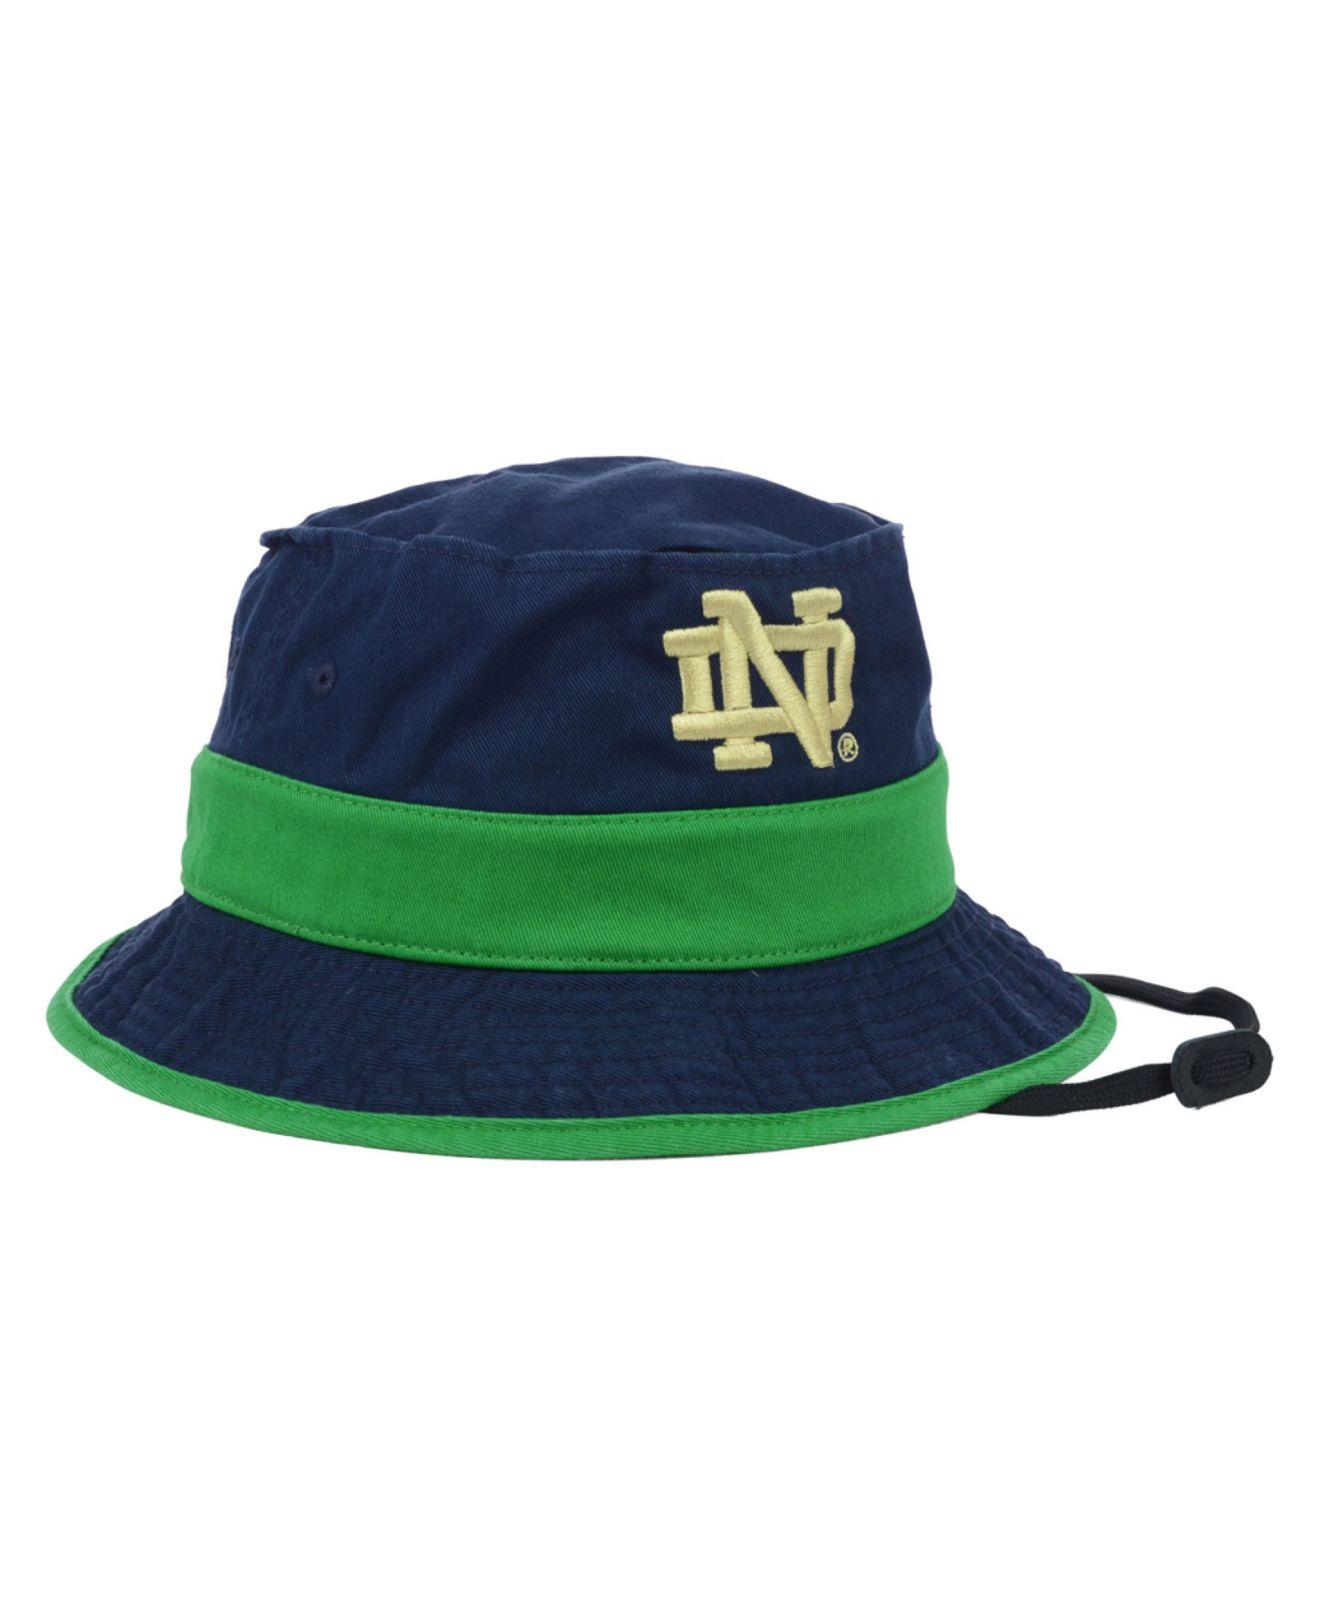 ... order lyst adidas notre dame fighting irish cord bucket hat in blue for  men f7e57 0abbe 3c79cf865da0